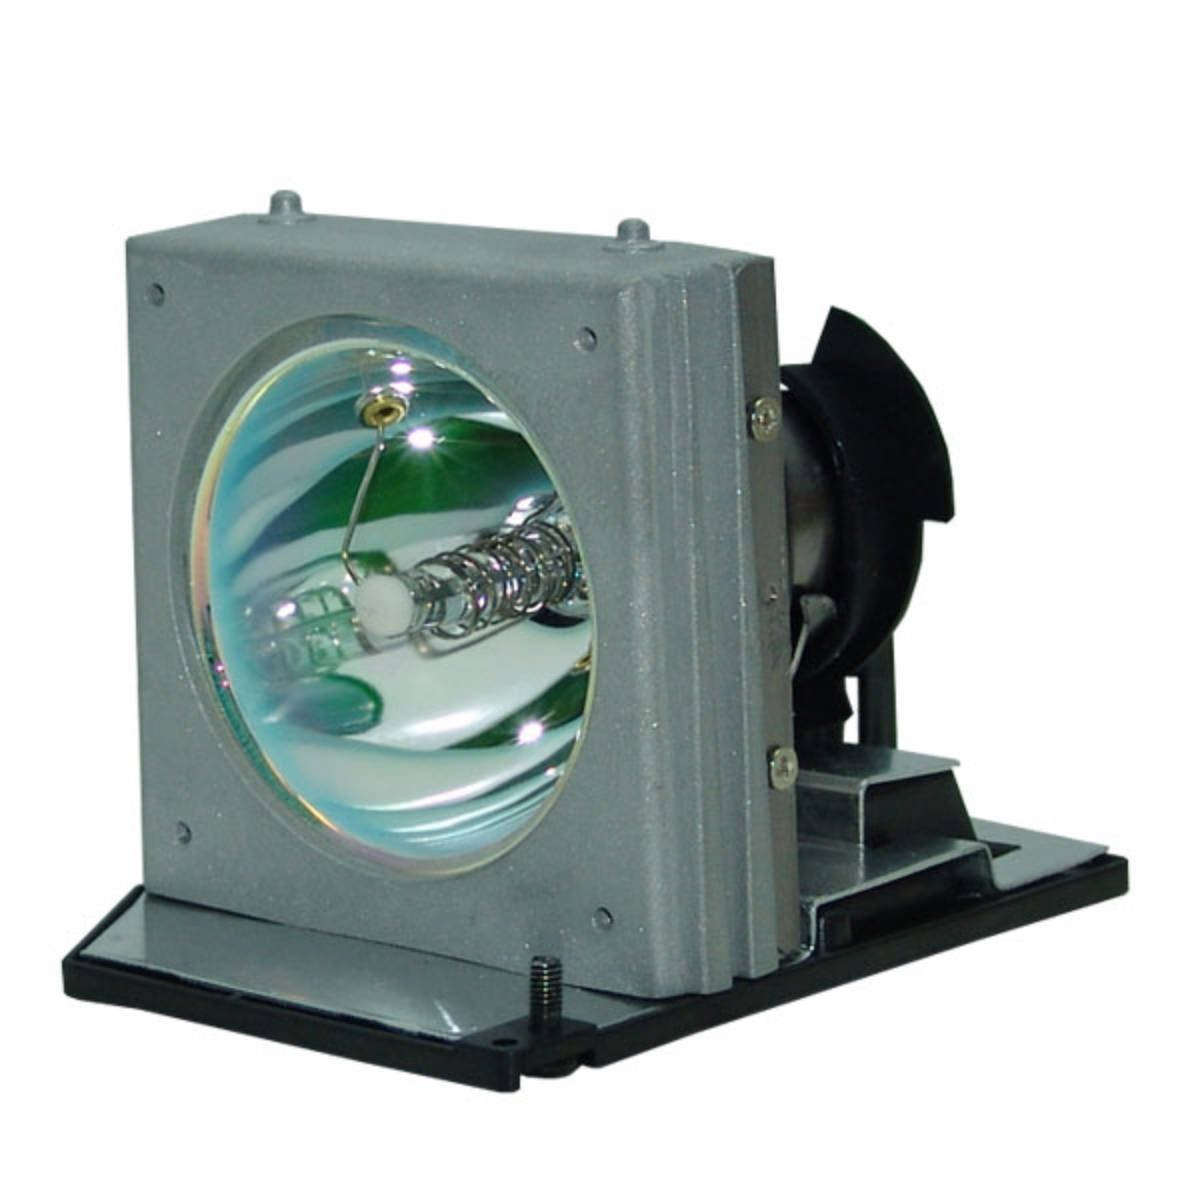 Здесь можно купить  BL-FS200B SP.80N01.001 Lamp for OPTOMA EP738p EP739 EP739H EP745 EZPRO739 H27 H27A HD720X X23M X25M Projector Bulb with housing BL-FS200B SP.80N01.001 Lamp for OPTOMA EP738p EP739 EP739H EP745 EZPRO739 H27 H27A HD720X X23M X25M Projector Bulb with housing Бытовая электроника